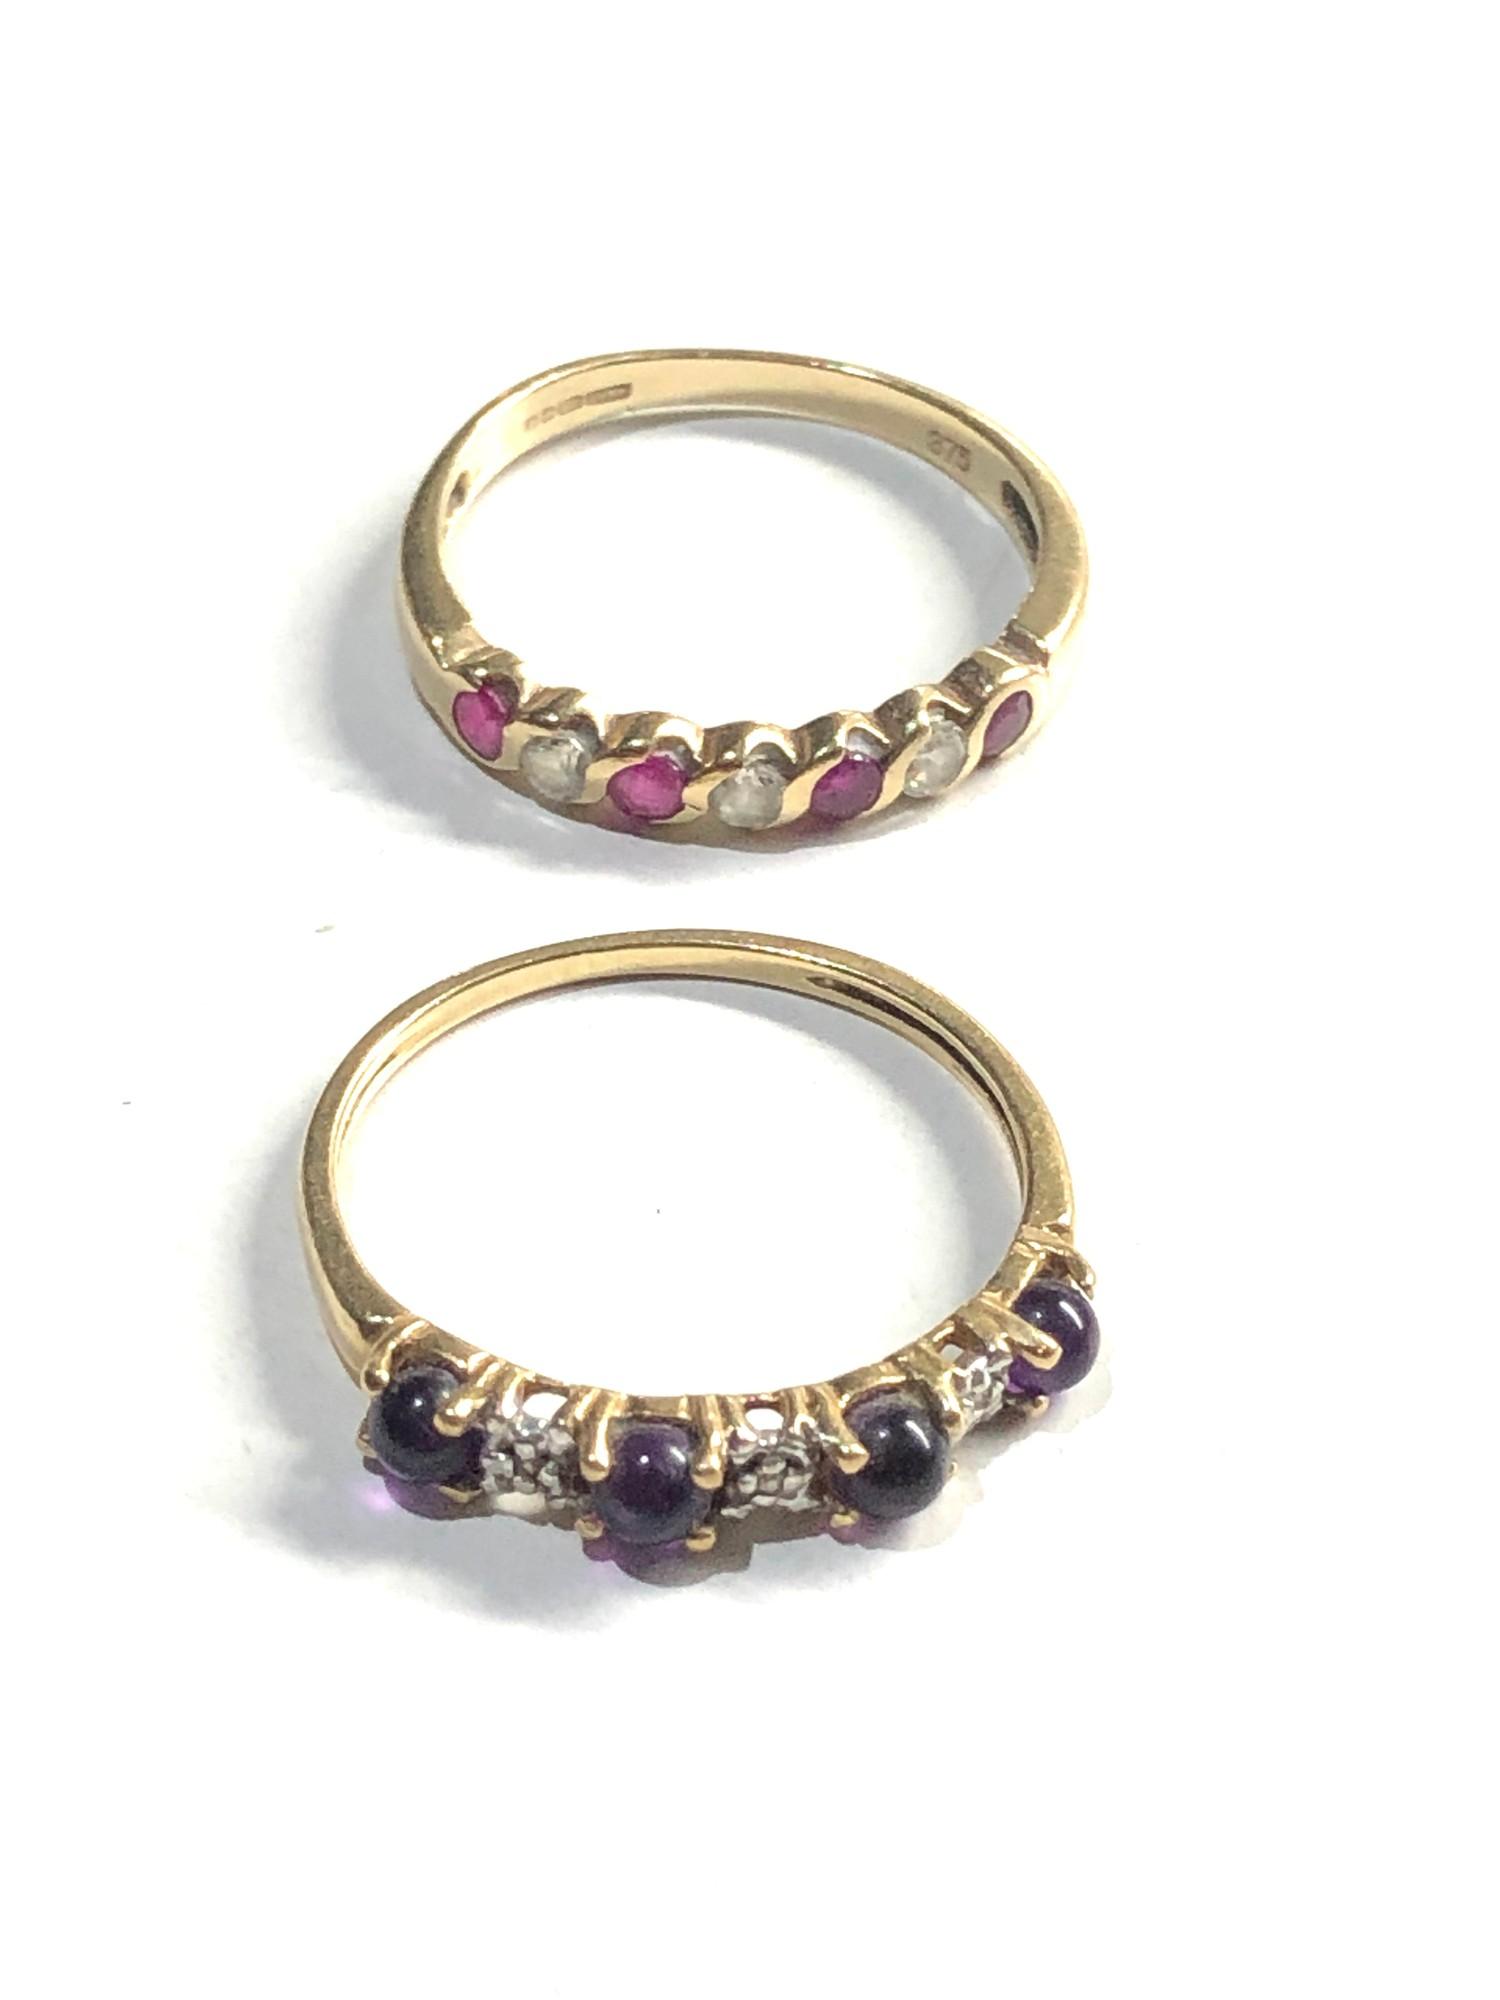 2 x 9ct Gold seven stone rings inc. ruby, amethyst, diamond 3.2g